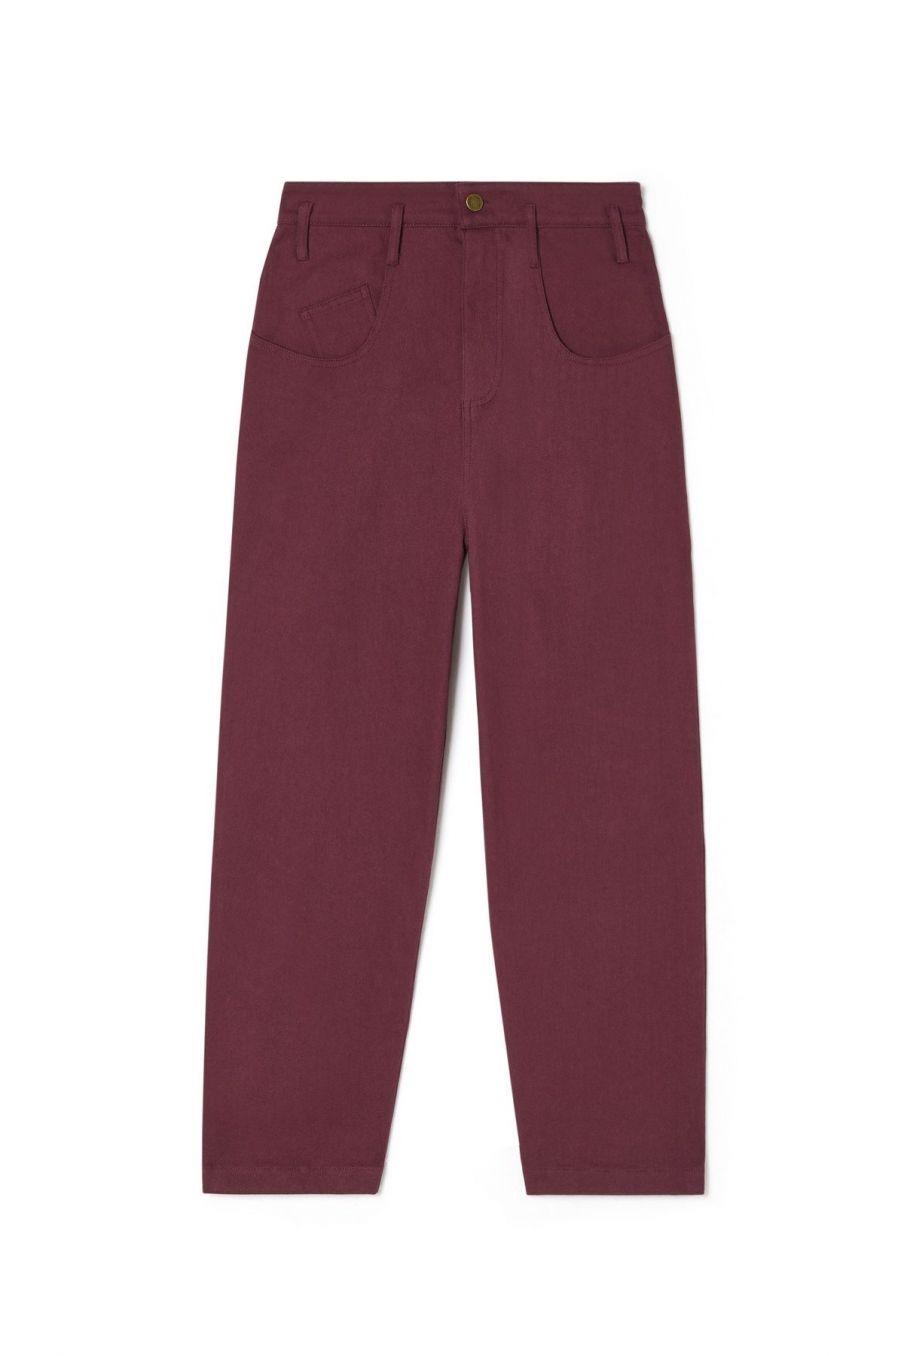 jeans femme lou burgundy - louise misha